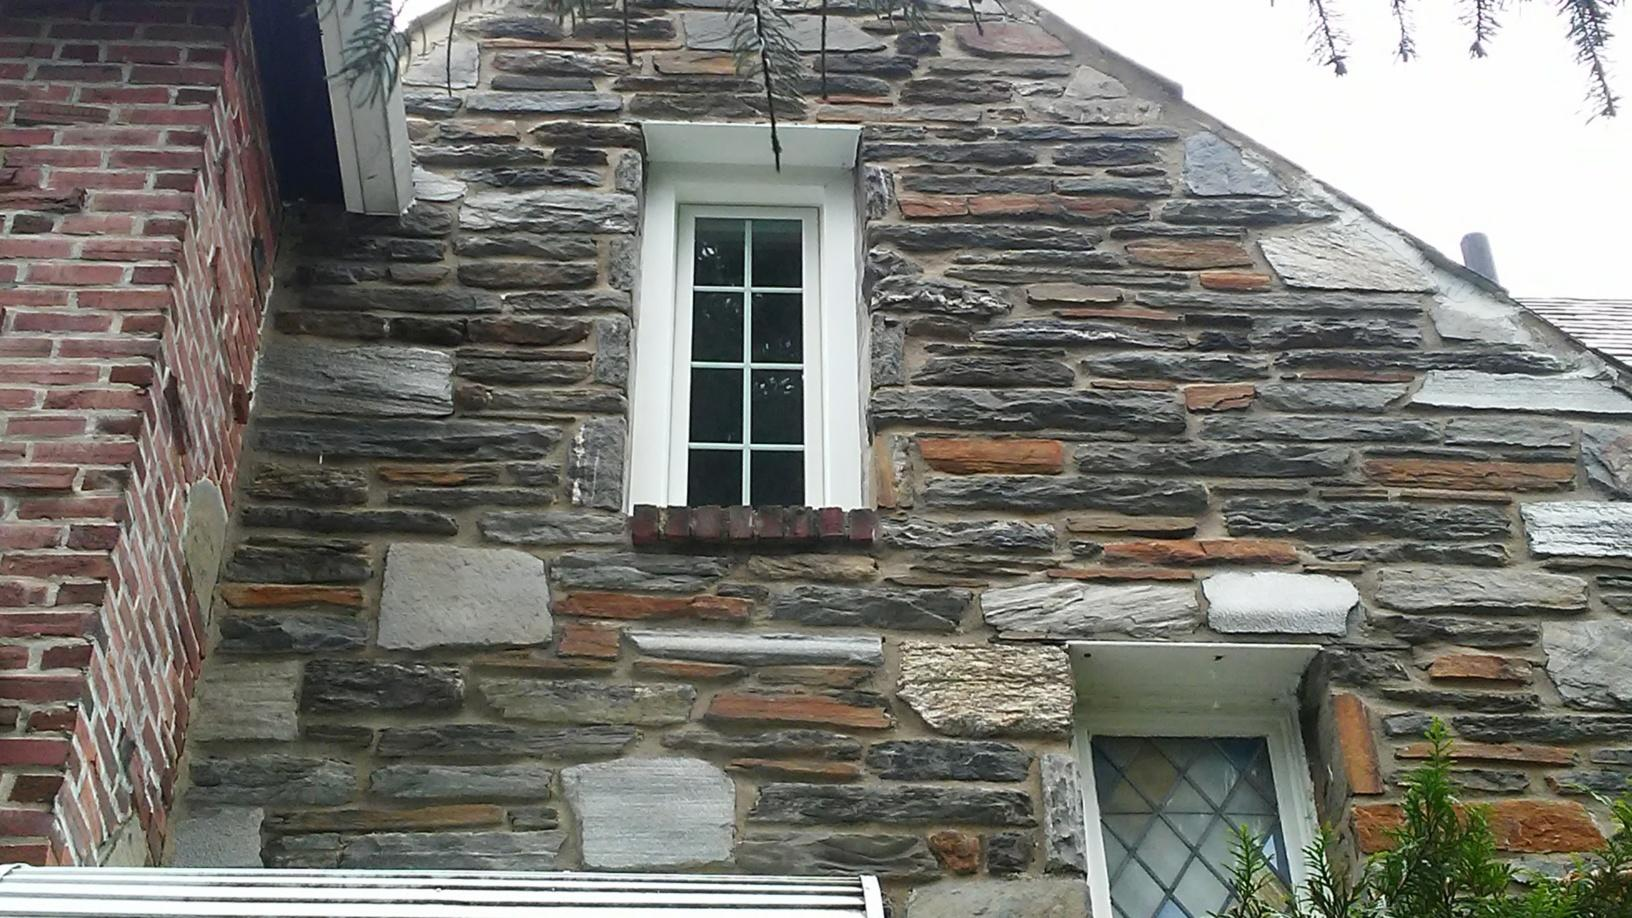 Marvin Infinity White Windows Installed on Stone Siding